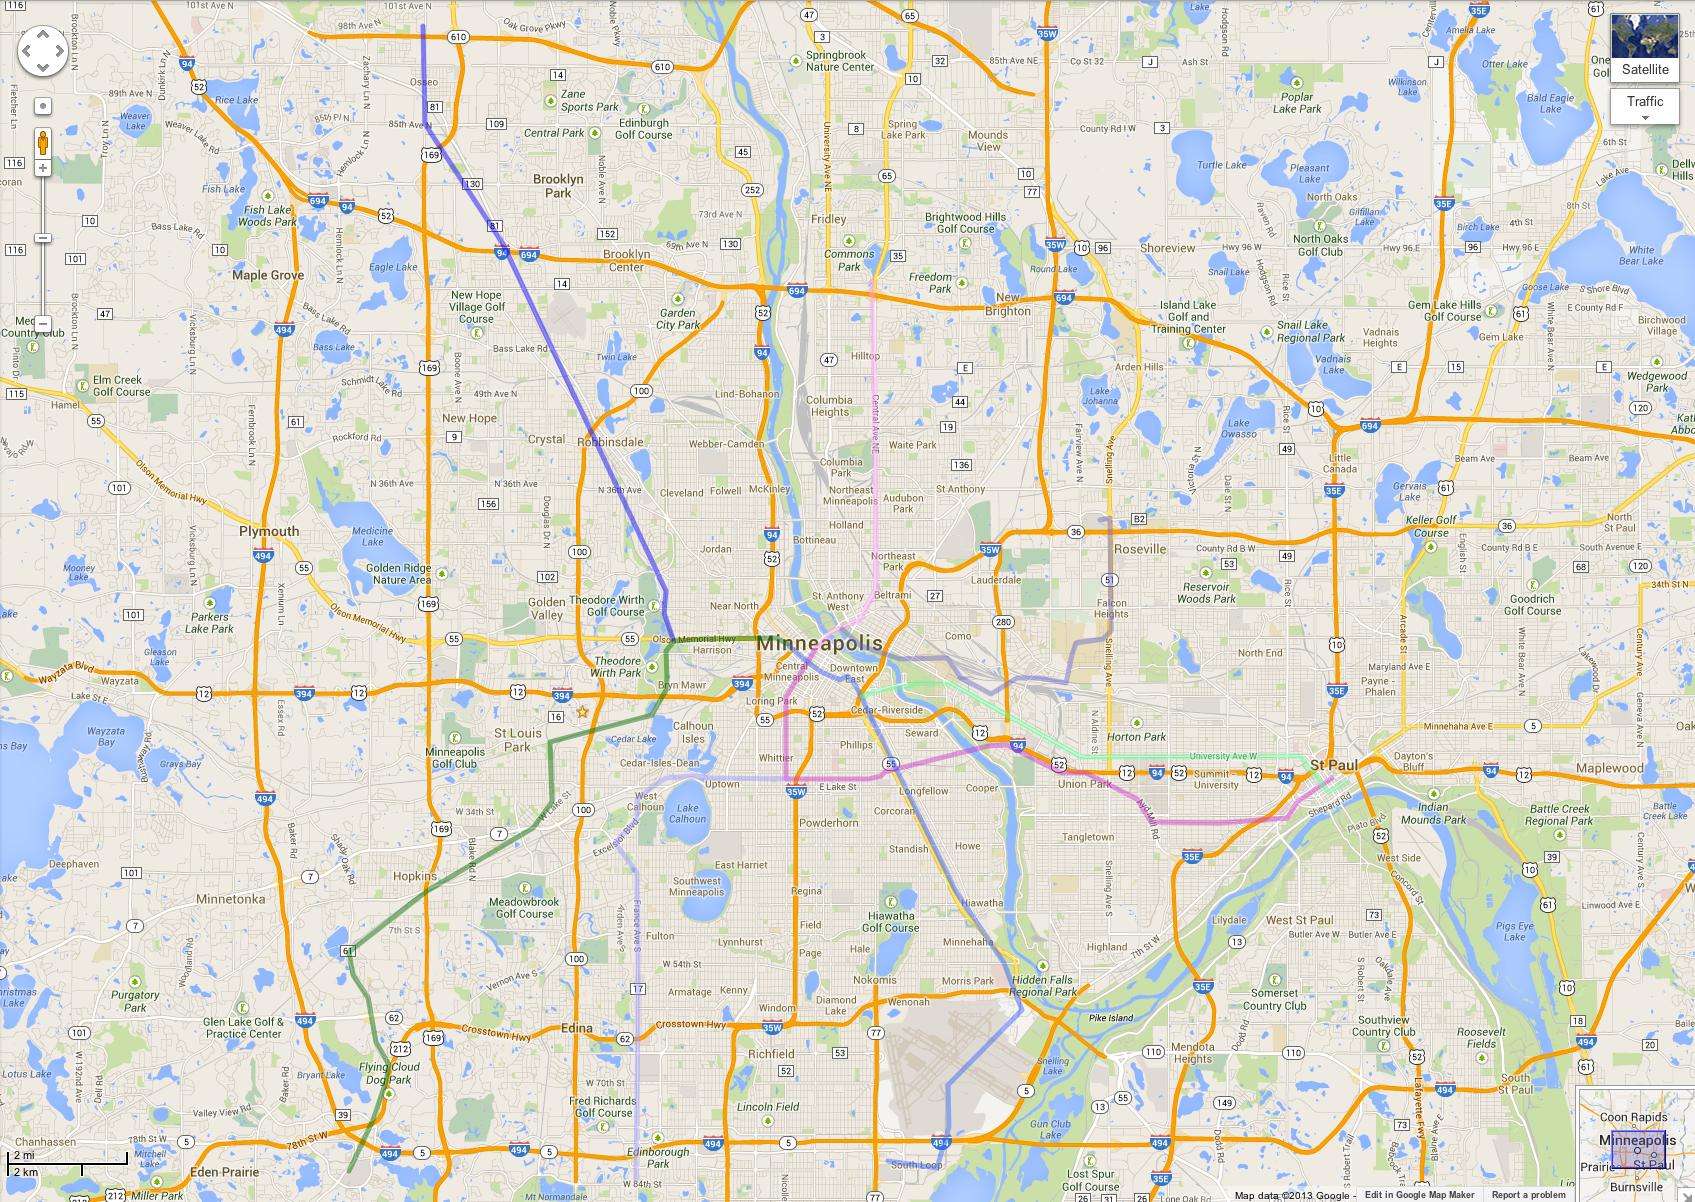 Rethinking the Minneapolis Transit Hub streetsmn